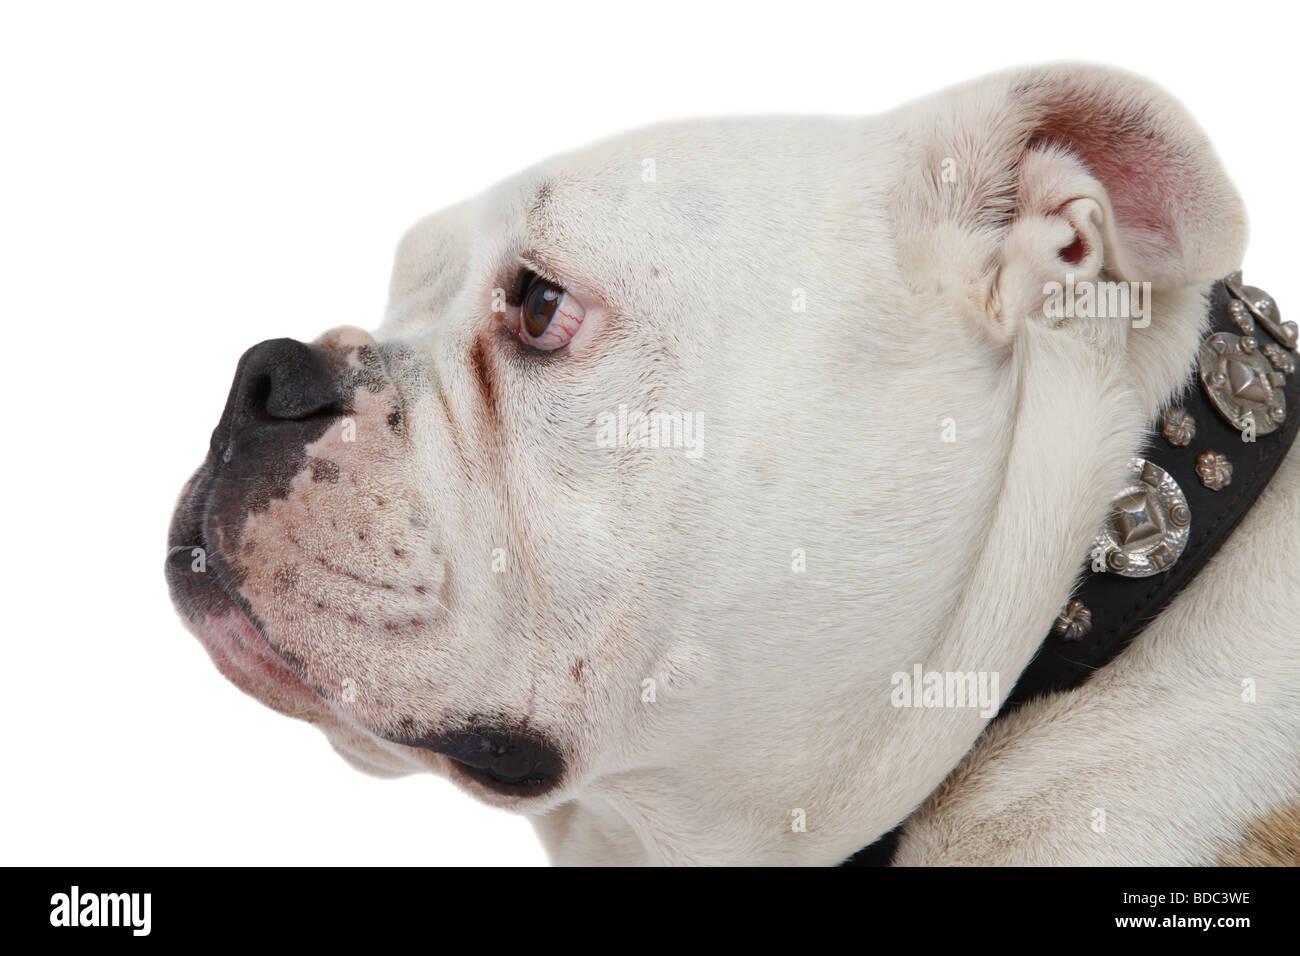 Englische Bulldogge Canis Lupus F Familiaris portrait